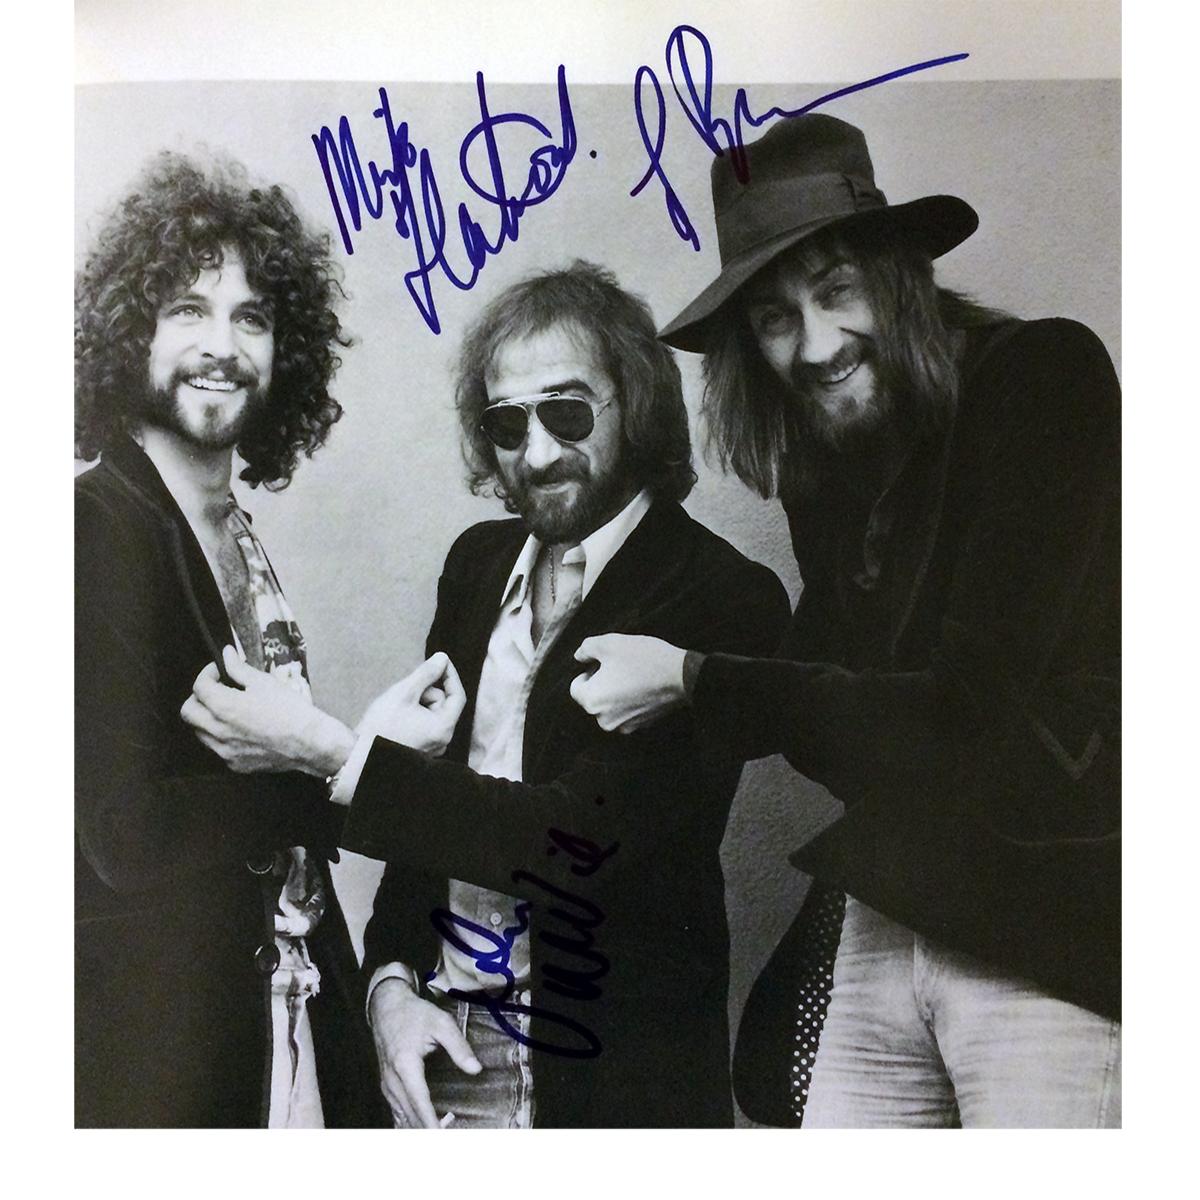 Fleetwood Mac Photo #4